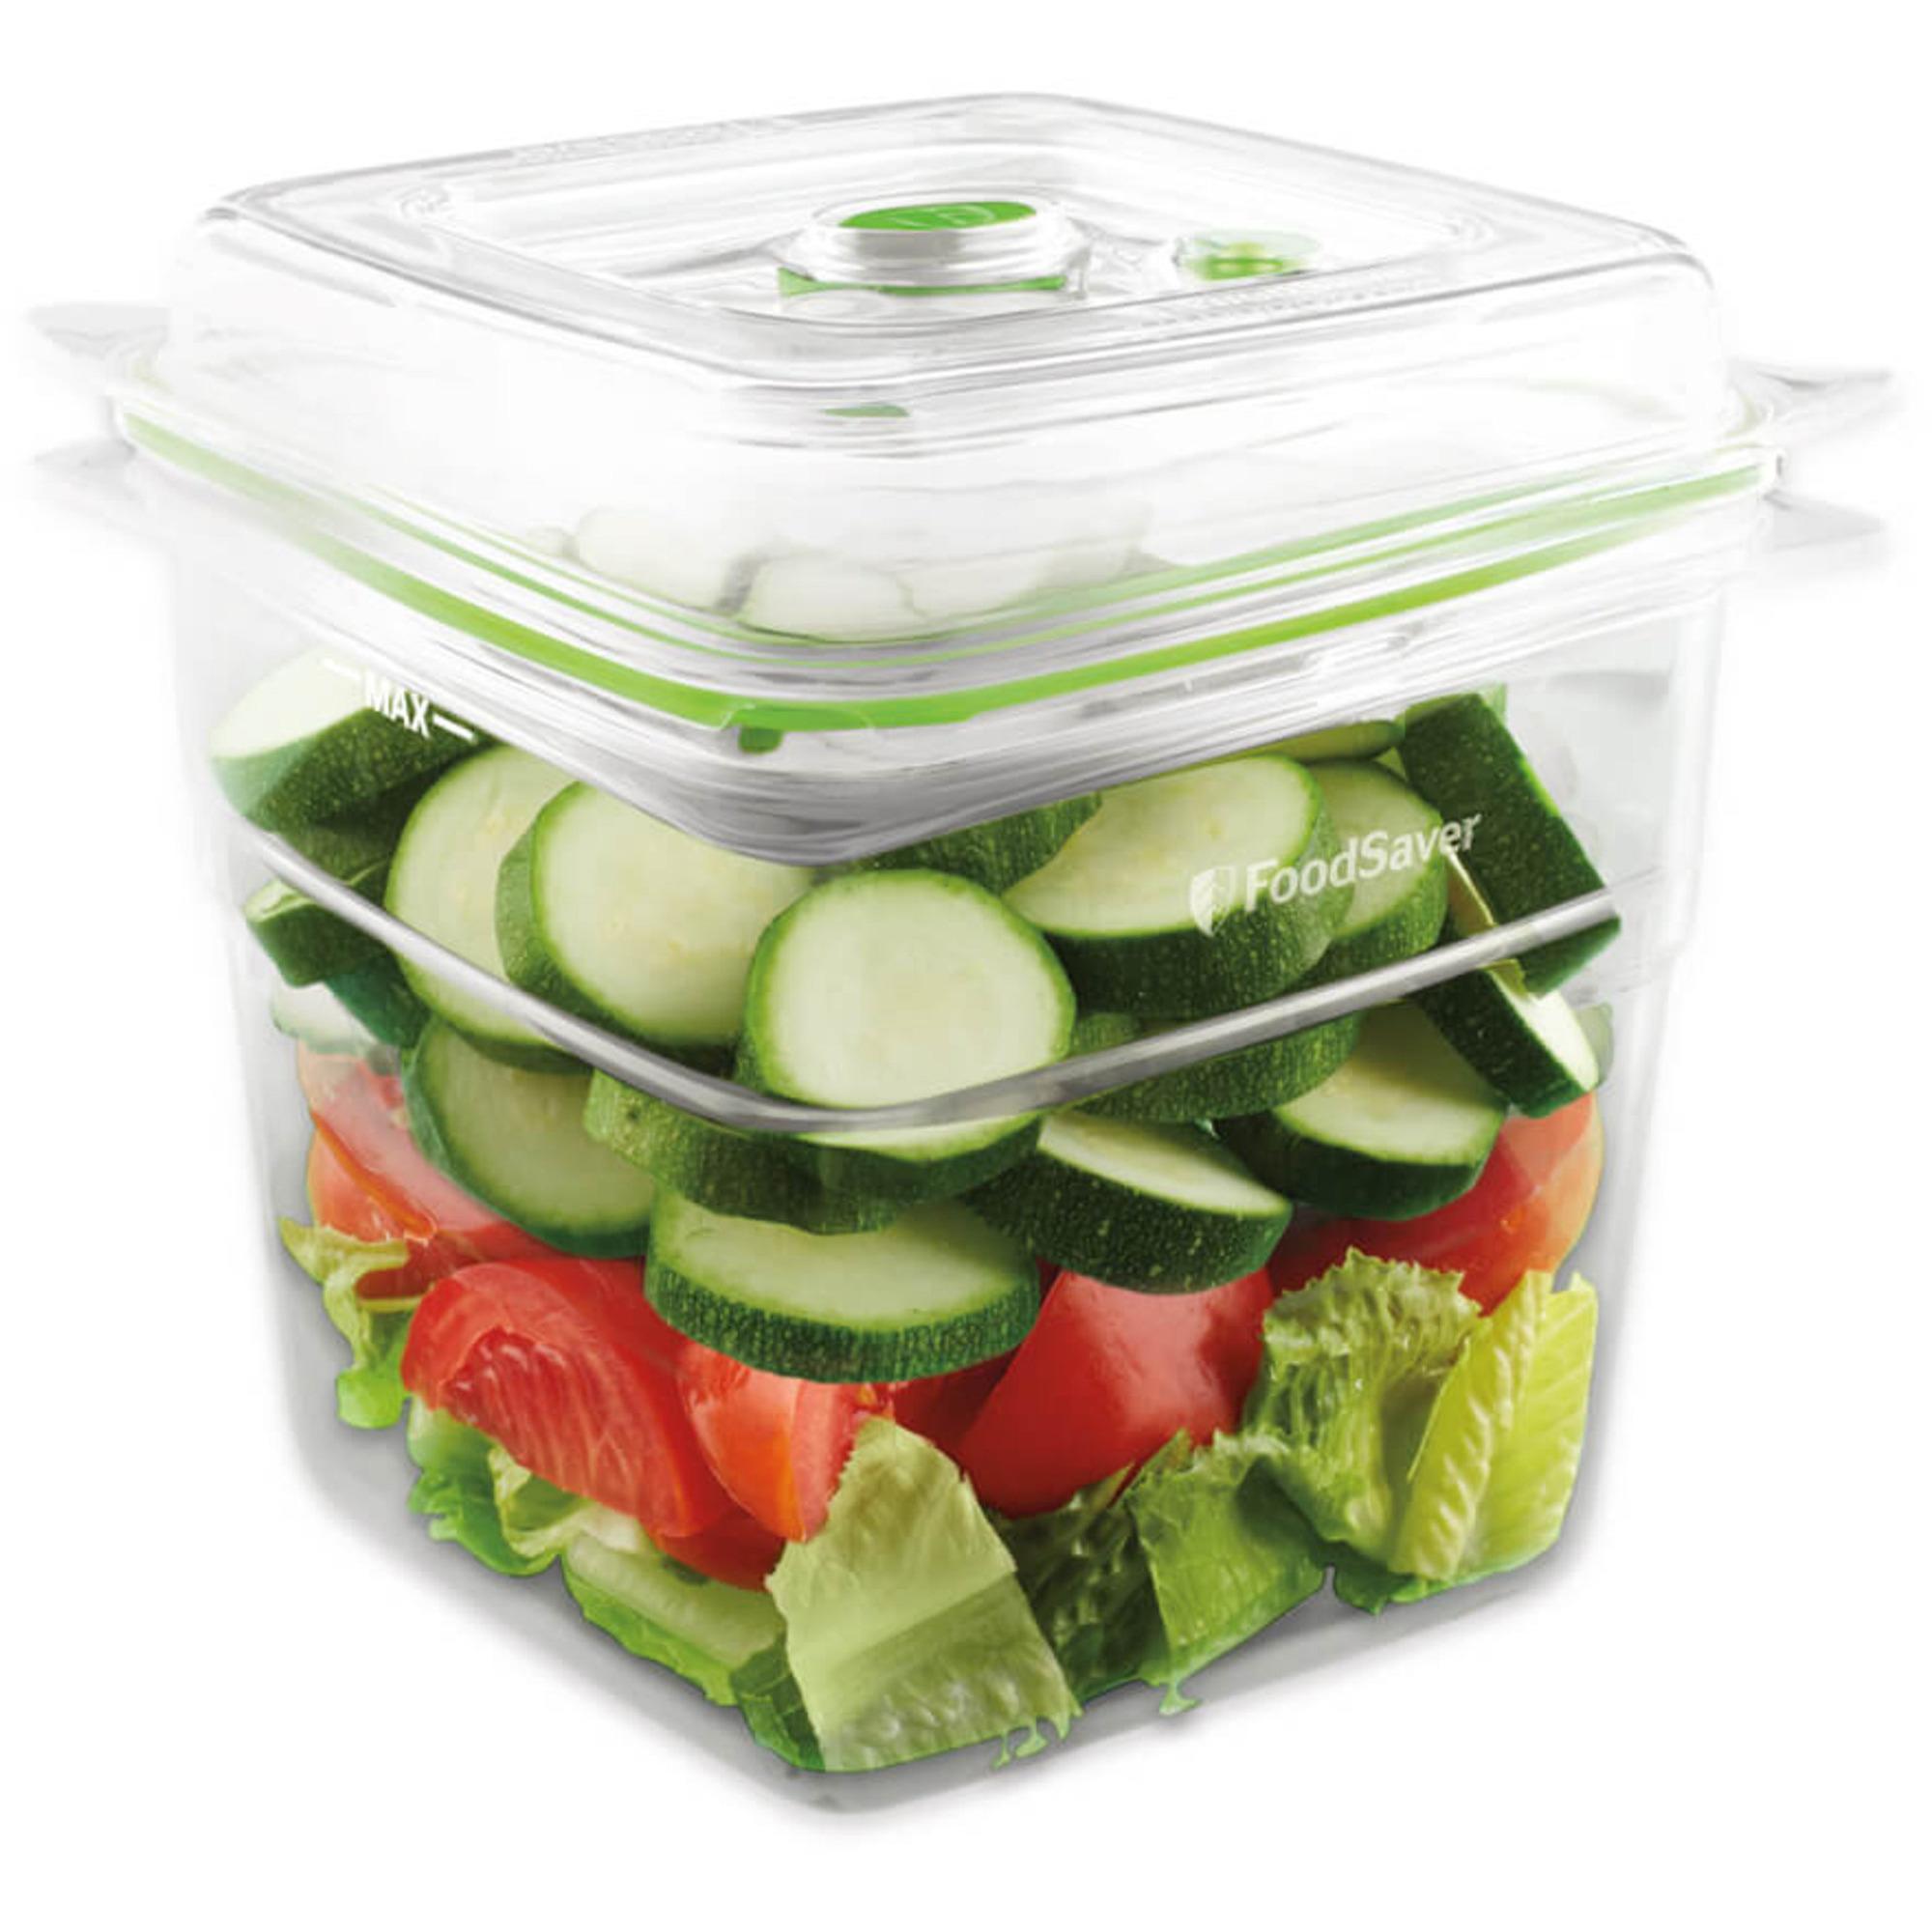 FoodSaver Fresh Förvaringslåda 18 L